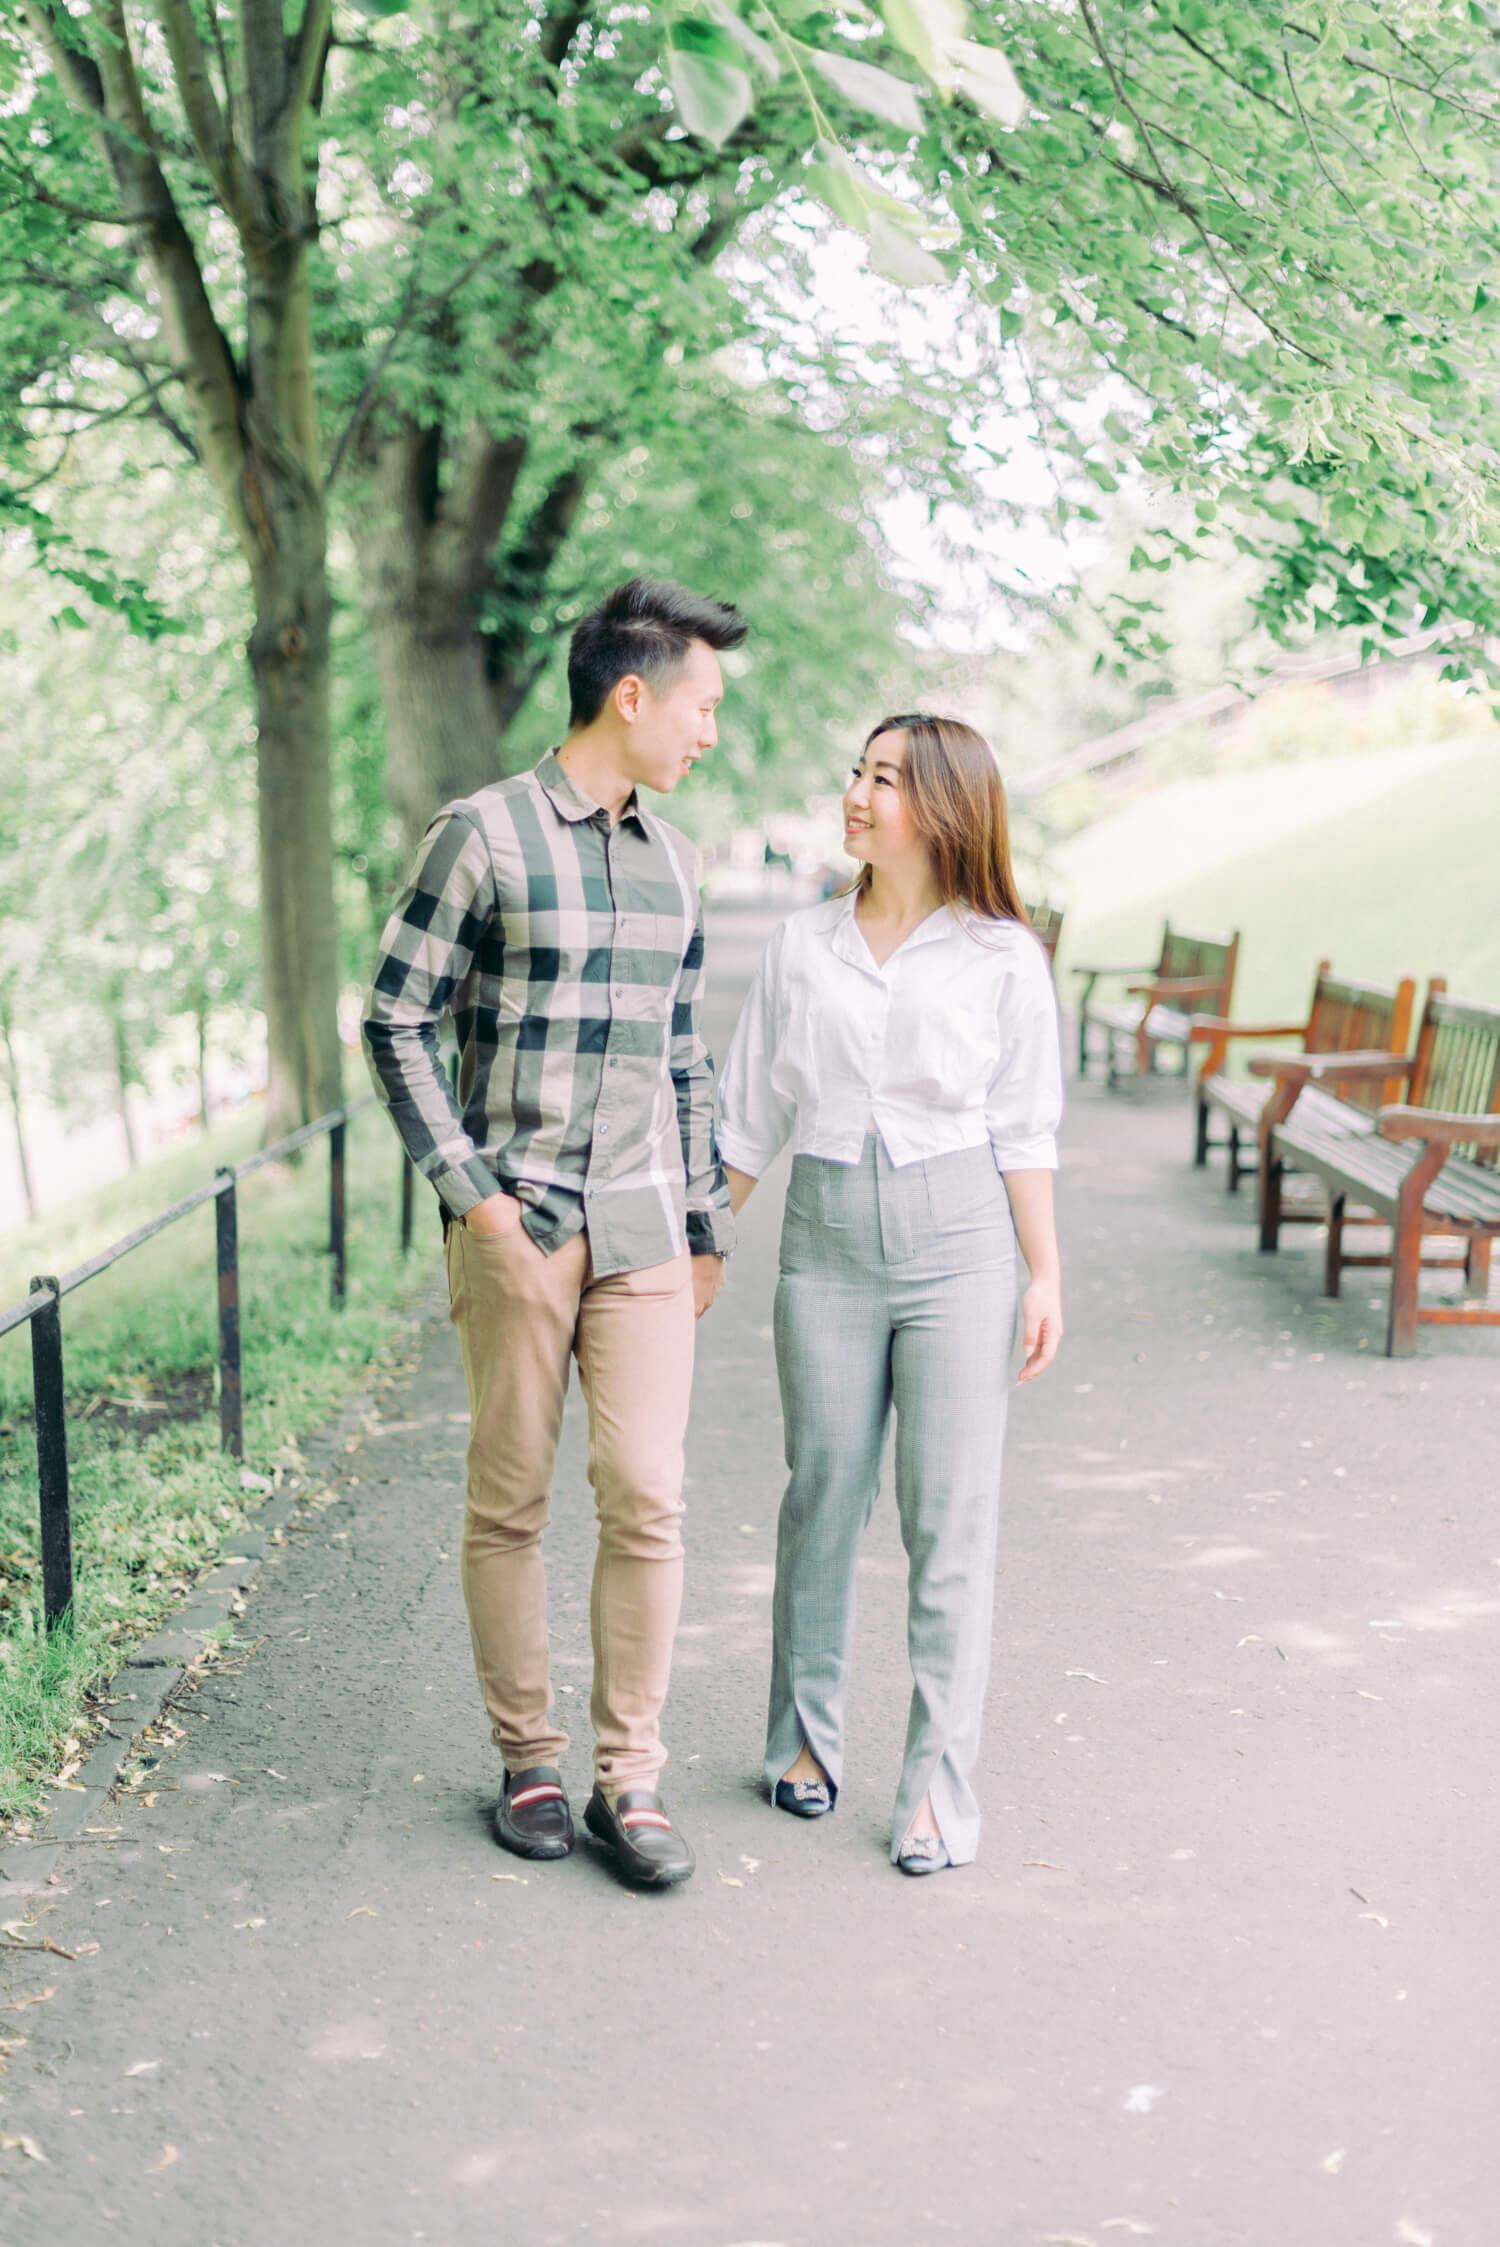 Edinburgh Royal Mile - Princes Street Garden engagement shoot